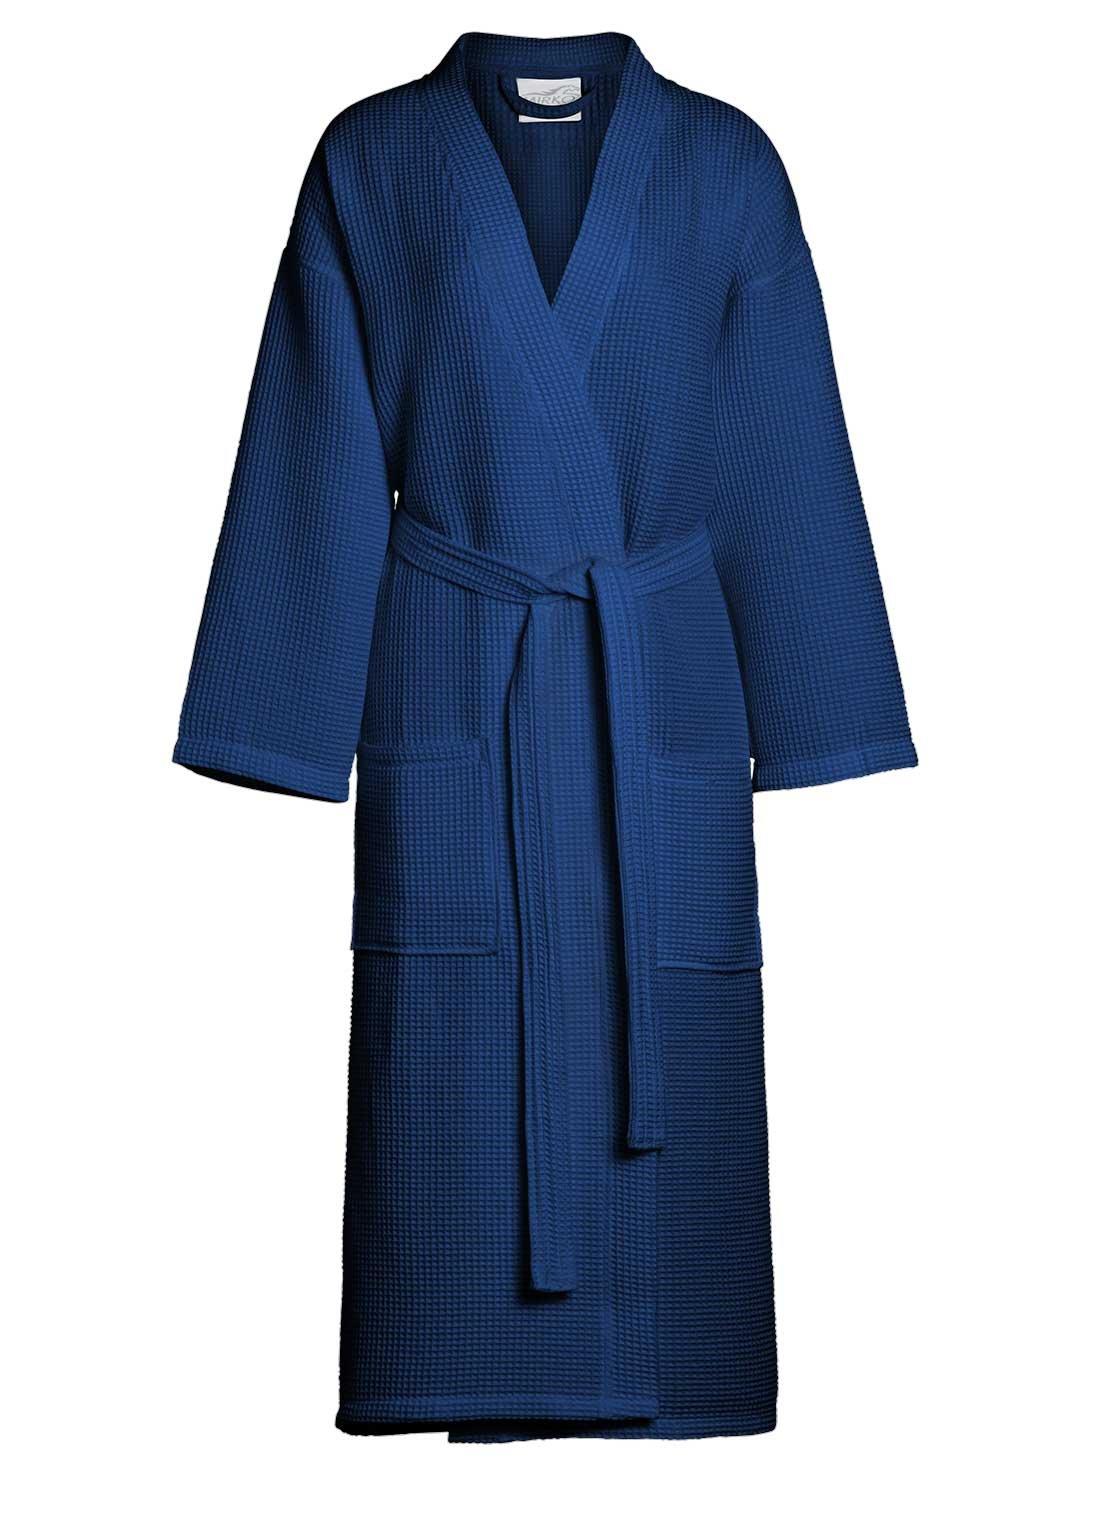 Men's Waffle Kimono Bathrobe Square Pattern - Spa Robe (Large/one Size, Navy)